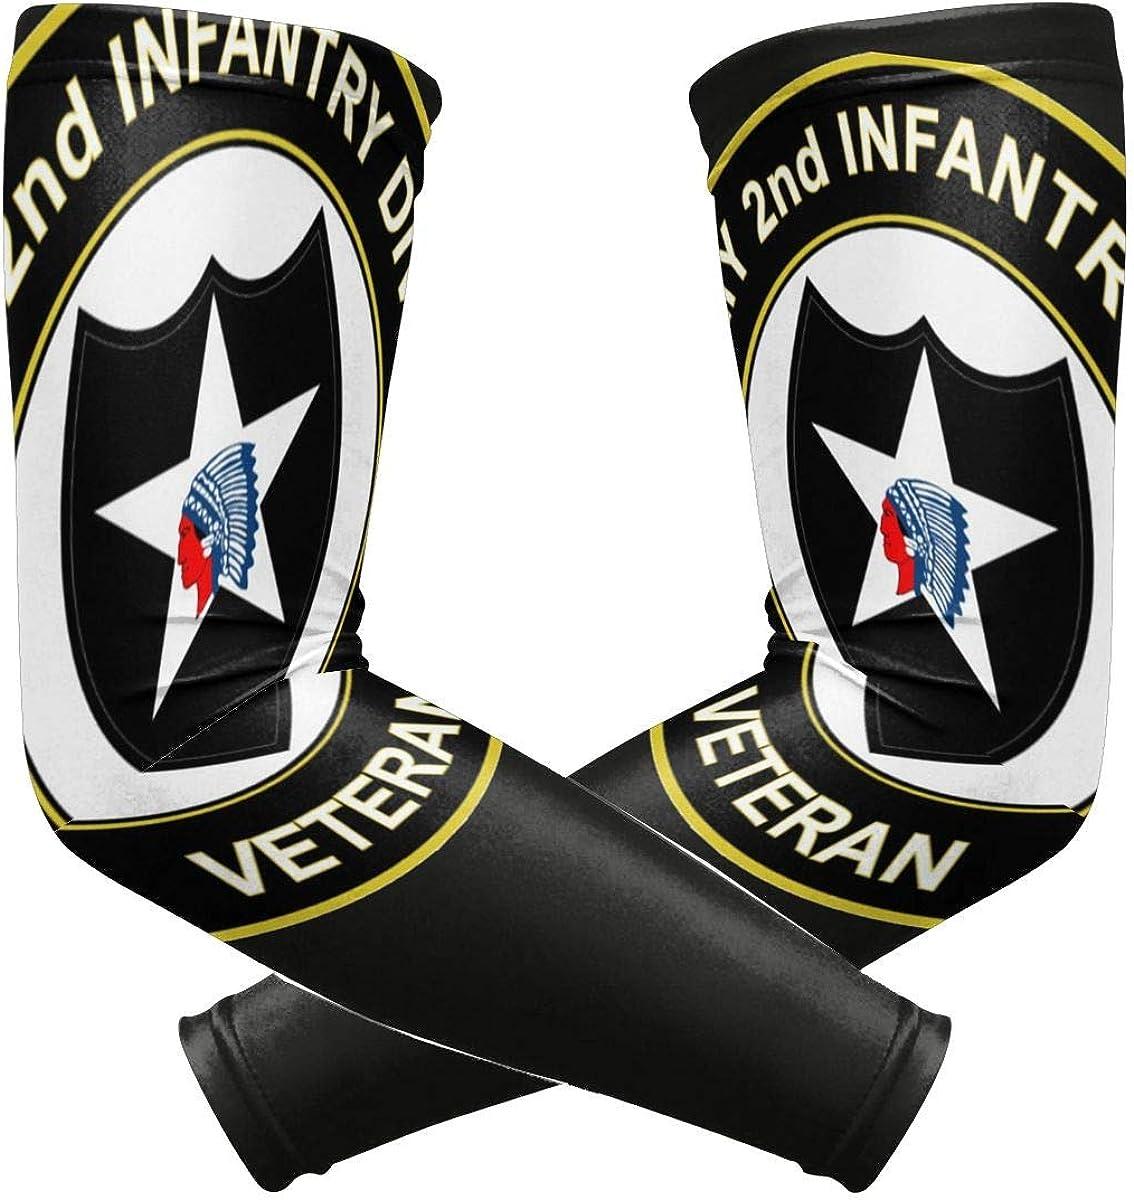 U.S. Army Veteran 2nd...